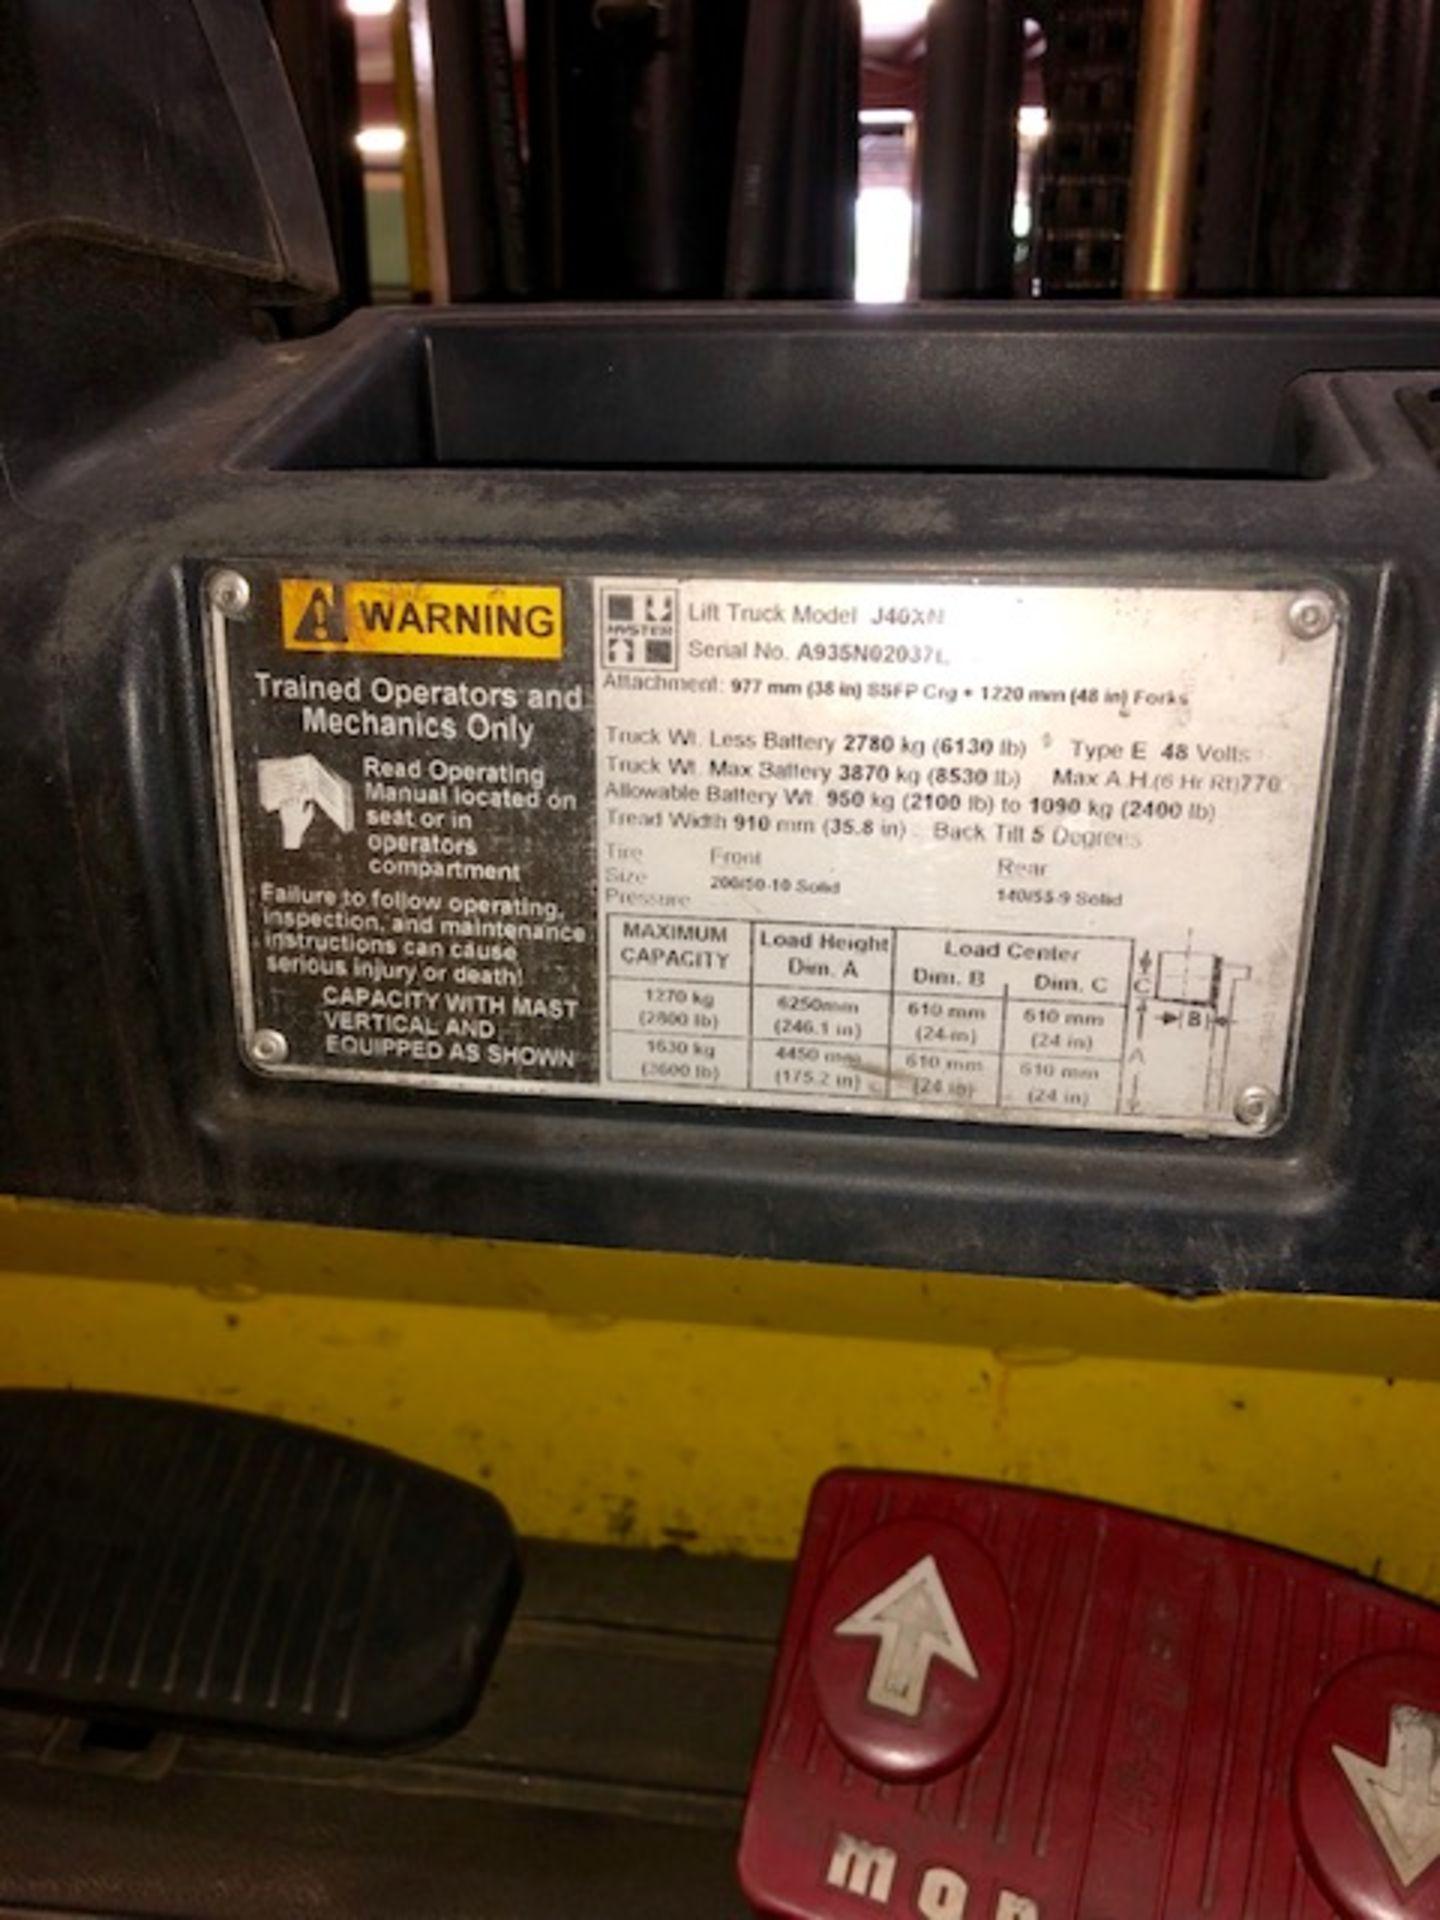 Lot 6 - Hyster forklift J40XN w/48V battery